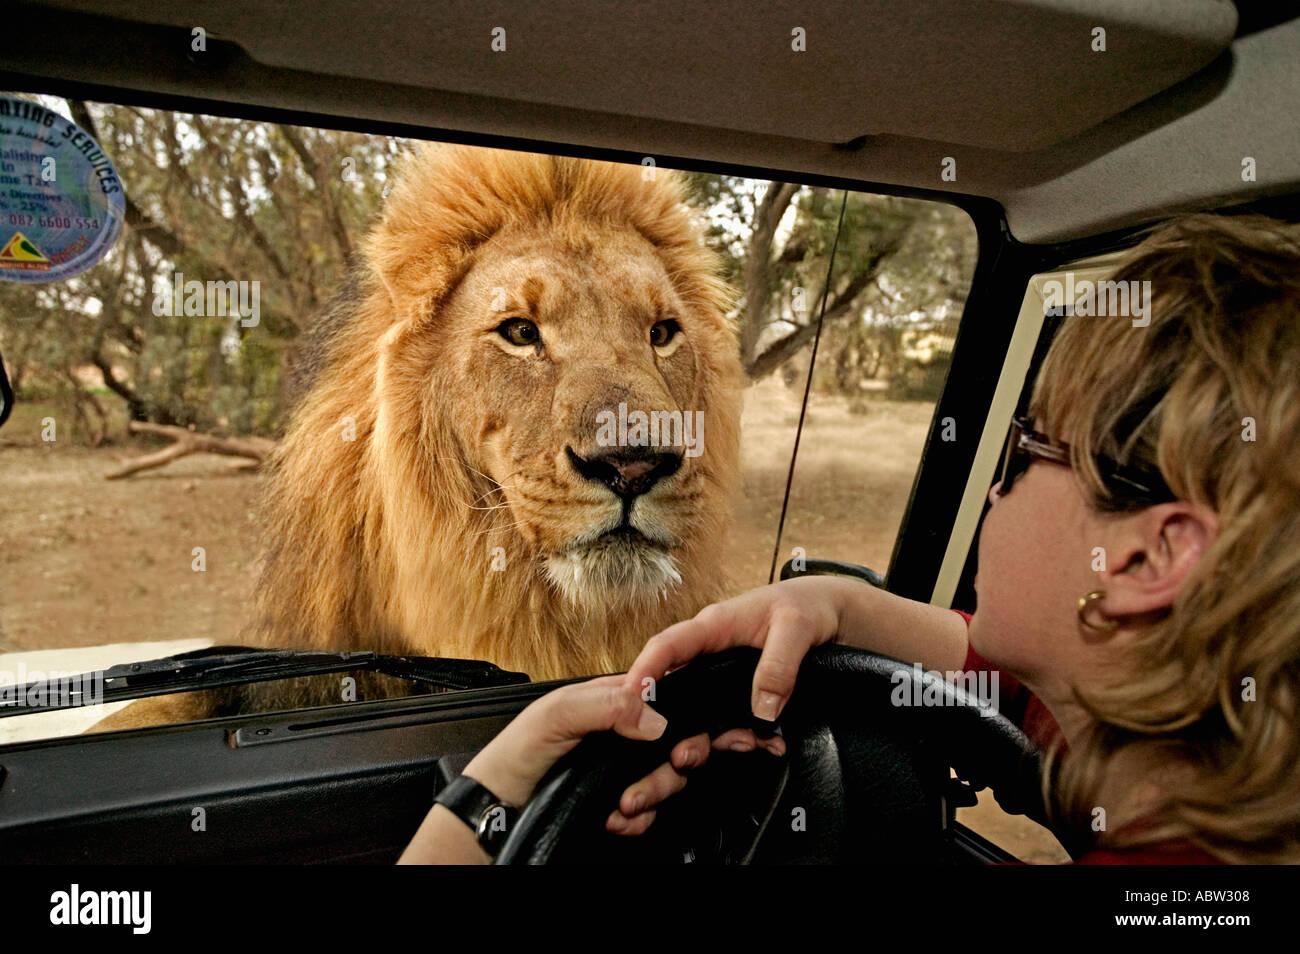 Löwe Panthera Leo Löwe Blick durch Fenster des touristischen Fahrzeug Modell freigegeben Südafrika Dist Sub-Sahara-Afrika Stockbild